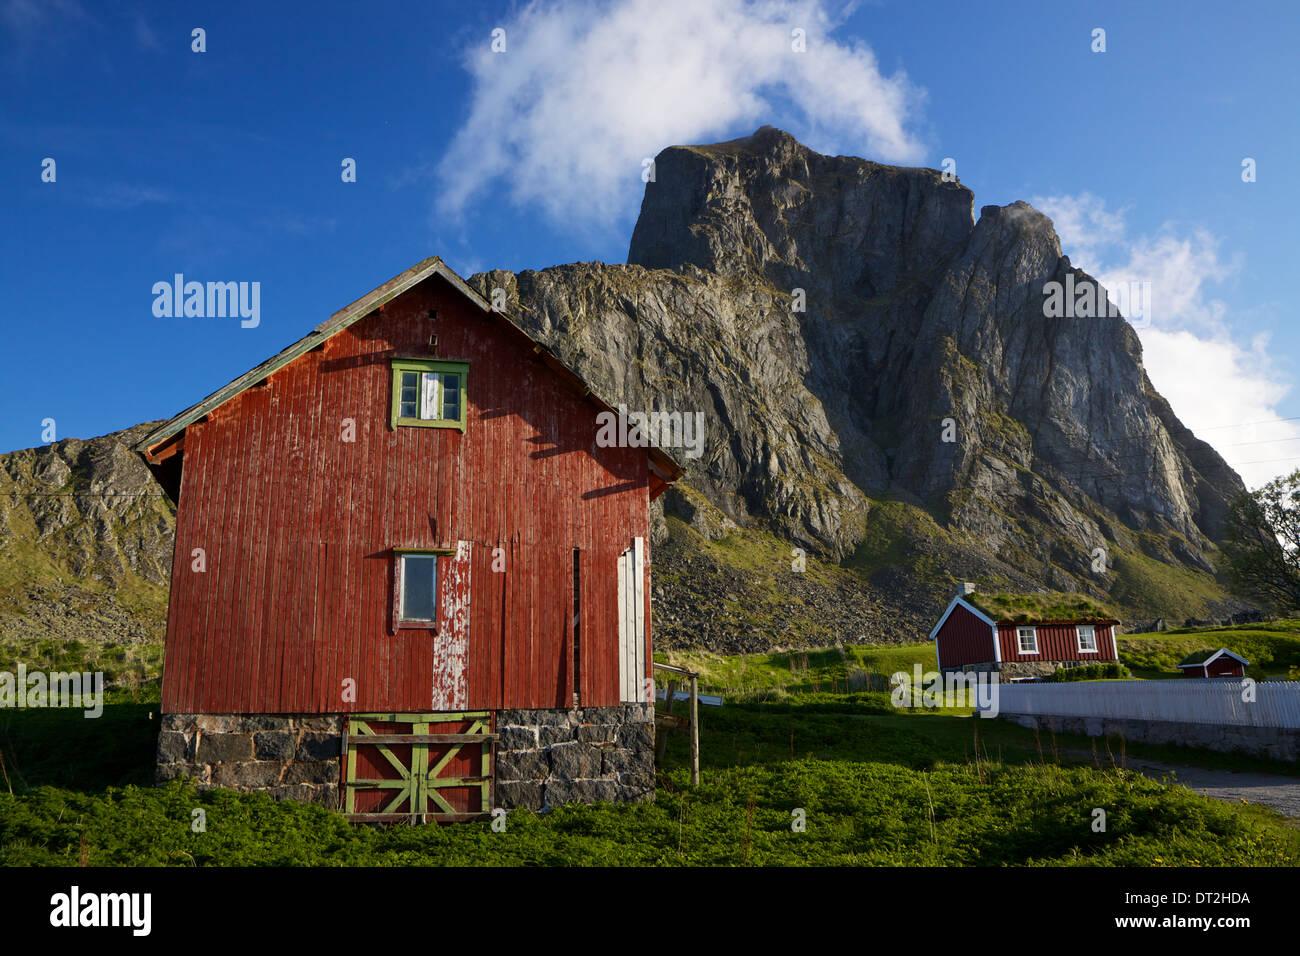 Traditional red wooden houses in norwegian village Nordland on island of Vaeroy, Lofoten - Stock Image